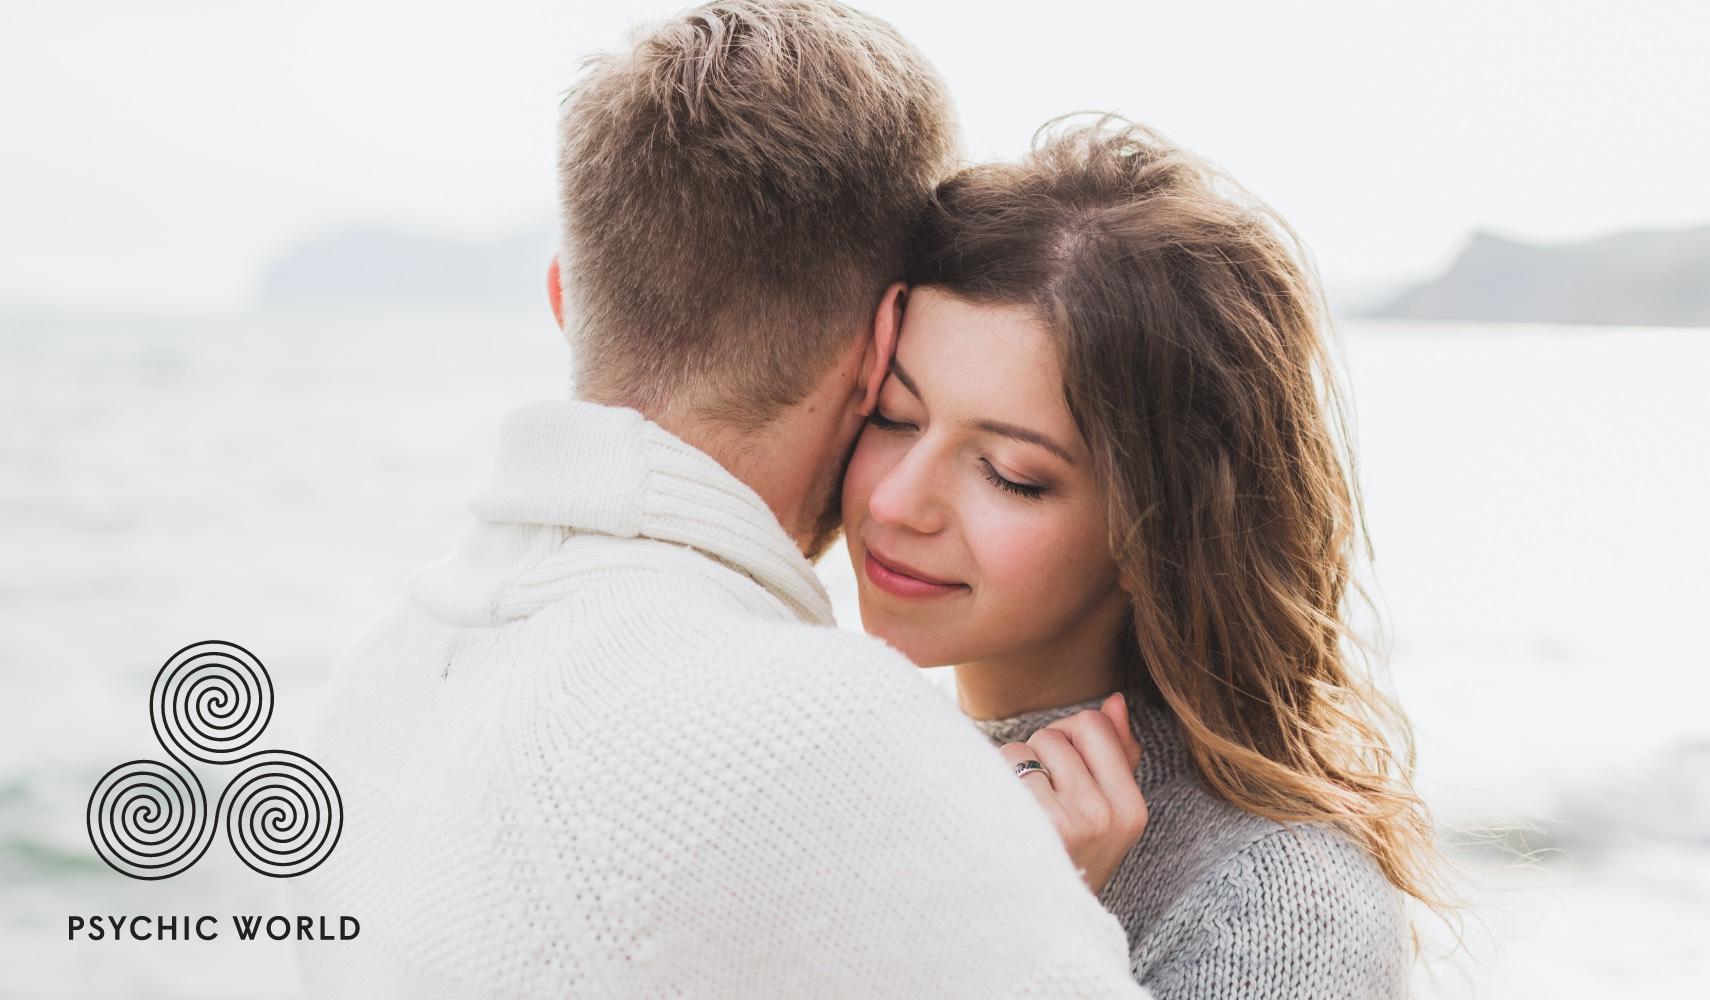 woman hugging a man near the sea